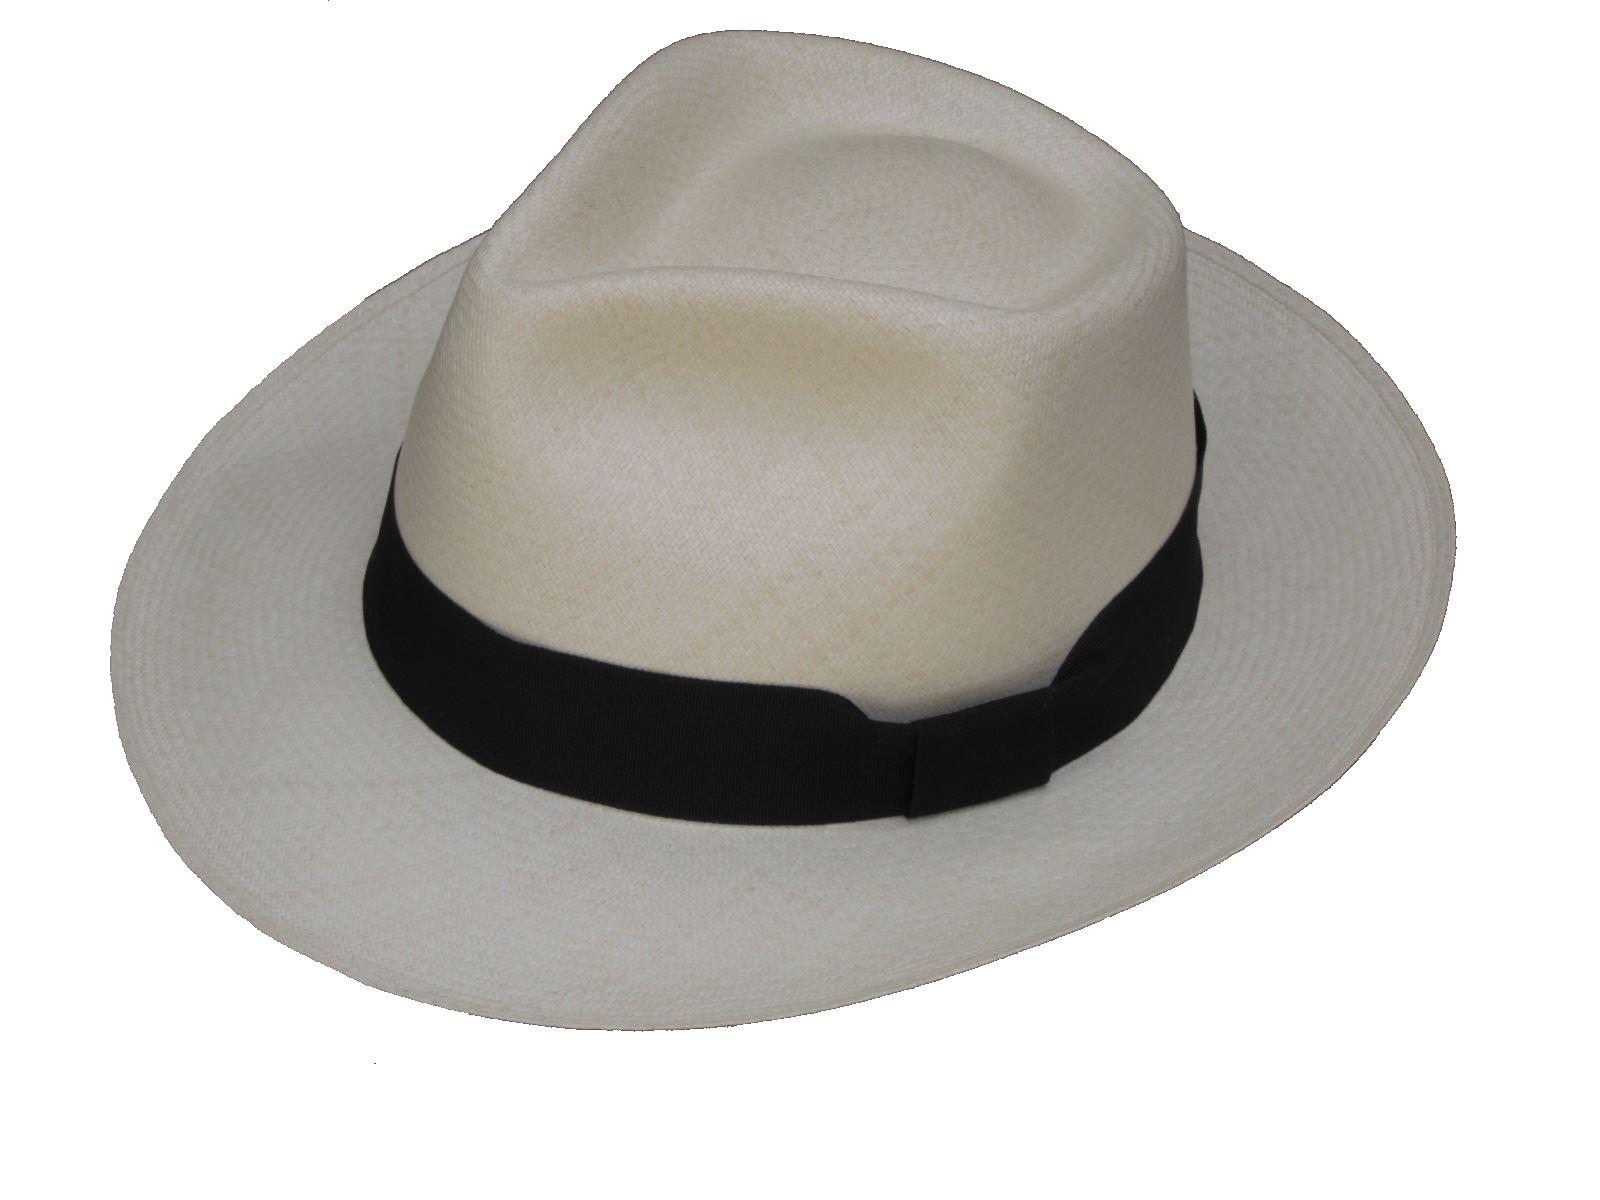 40c5eb4f2669b Panama hat Diamante fino